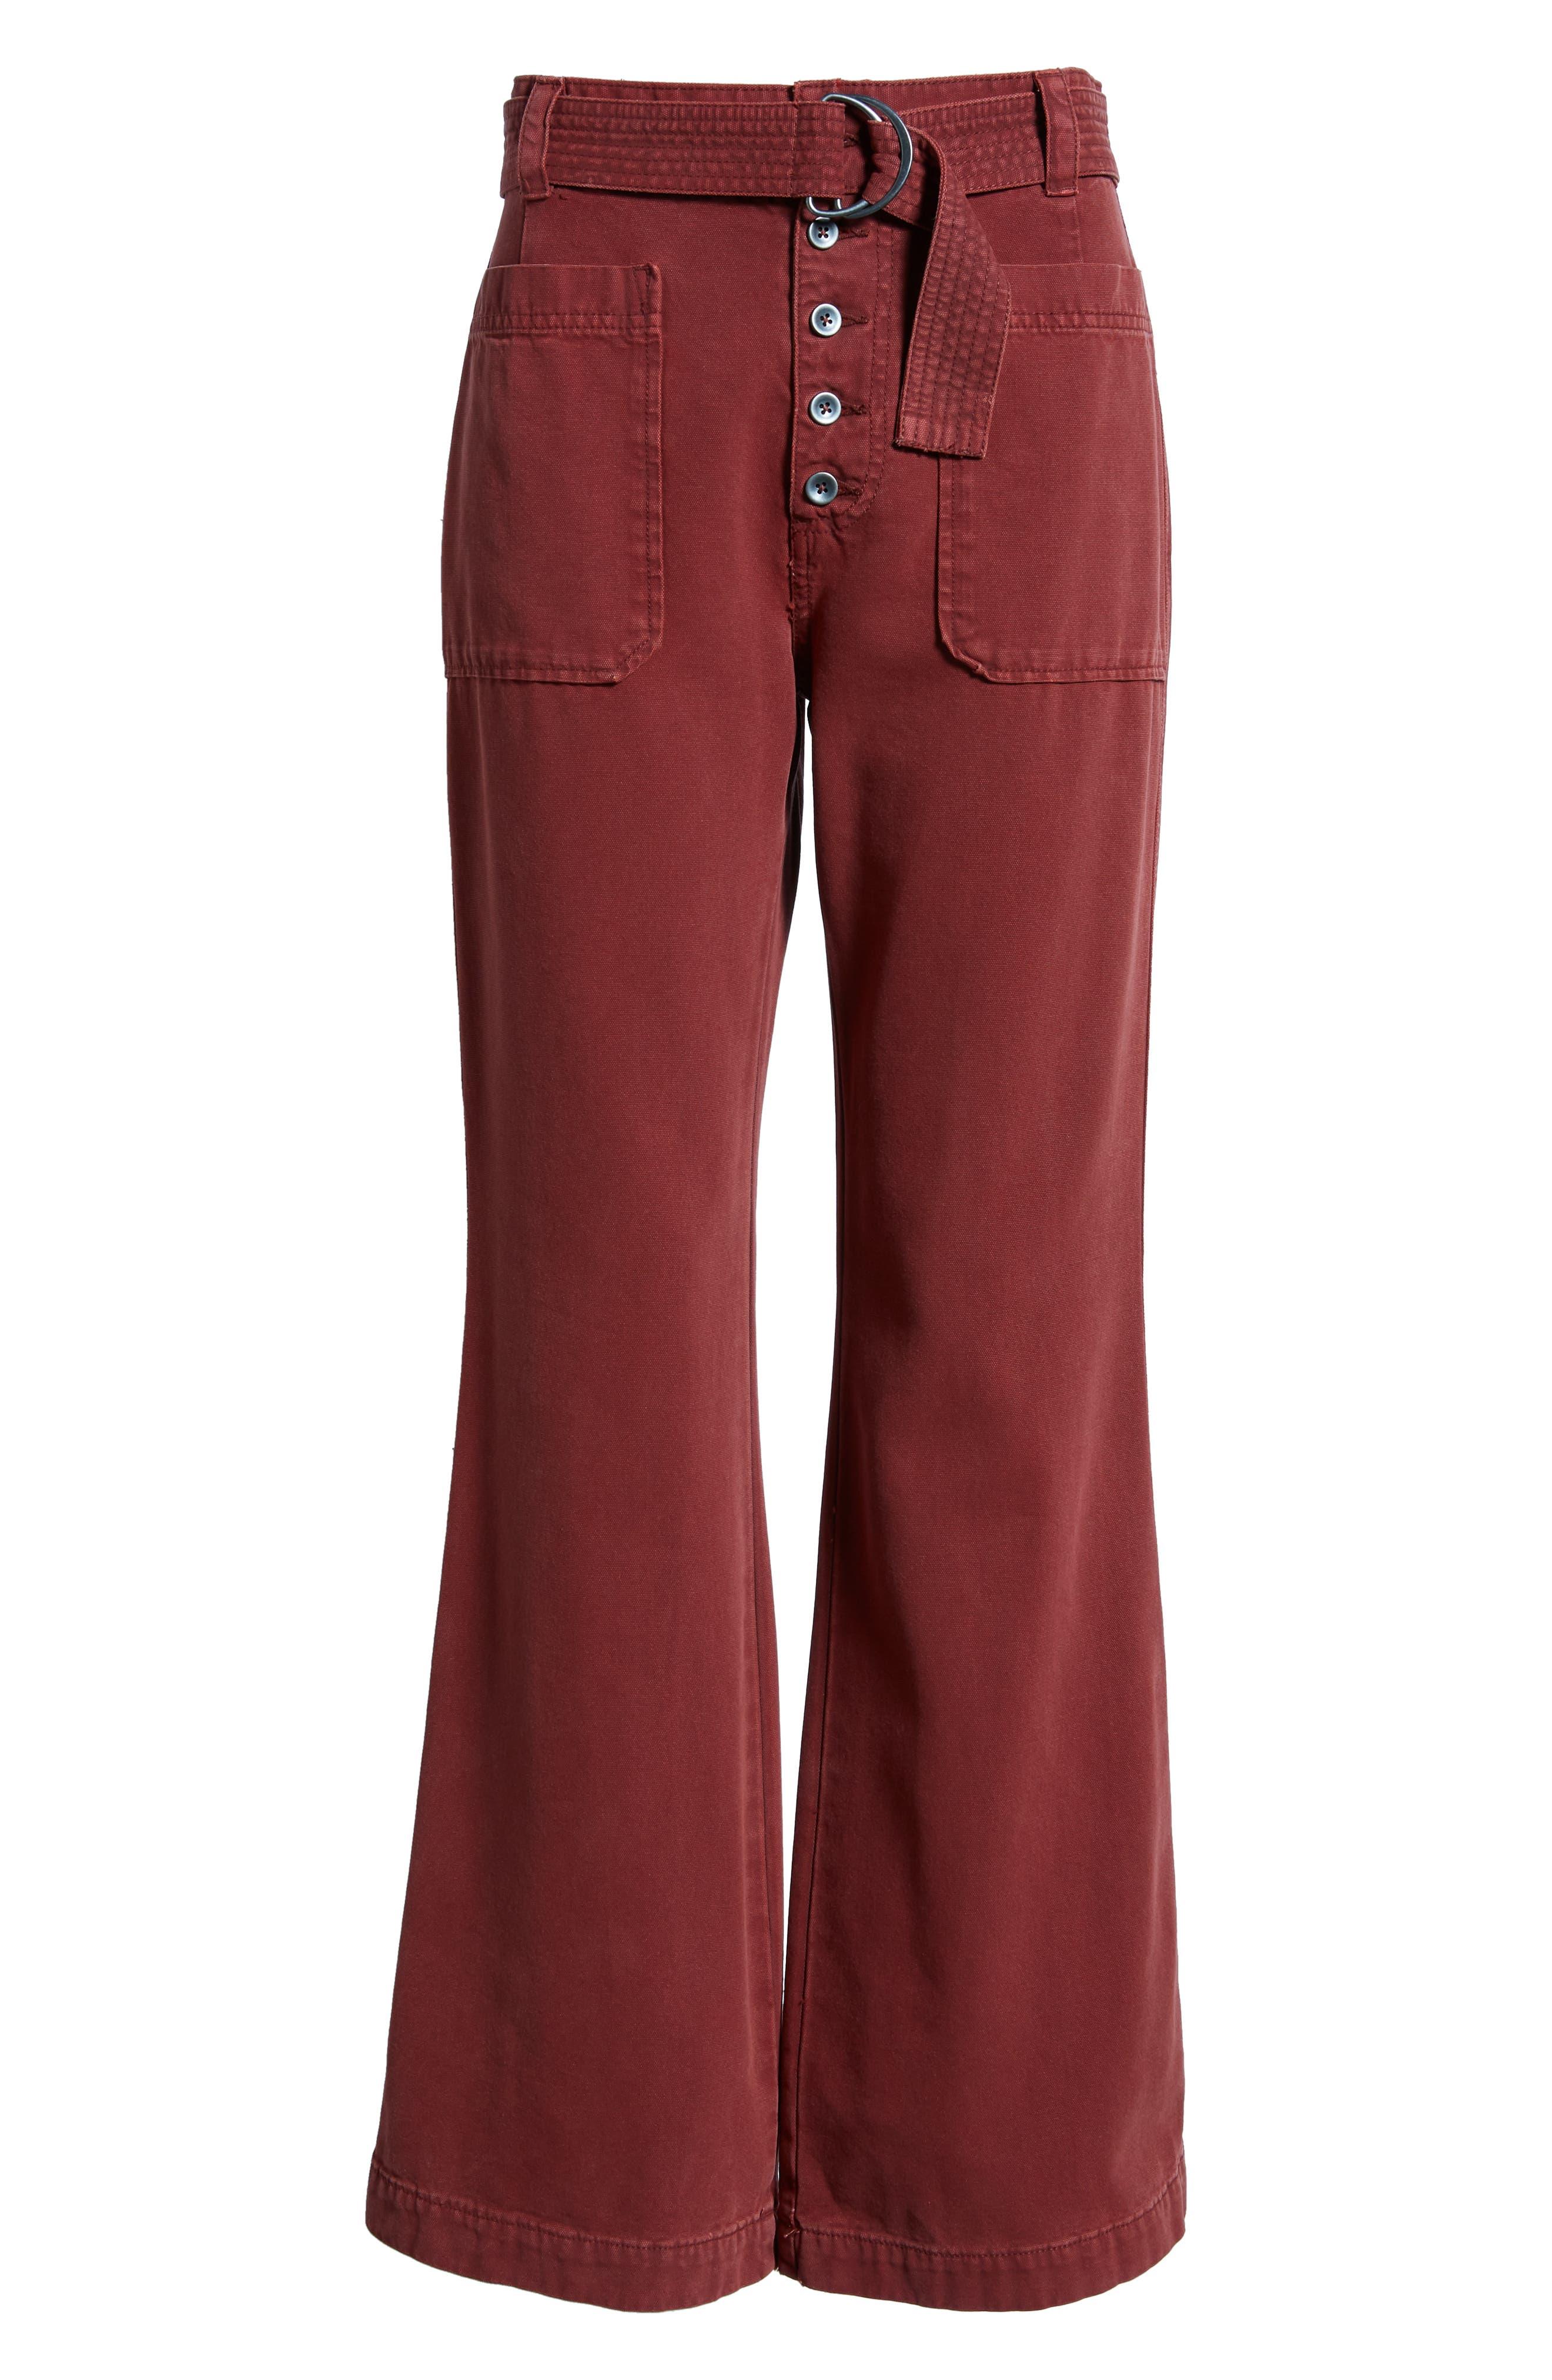 Corin Mod Slim Flare Pants,                             Alternate thumbnail 7, color,                             WINE